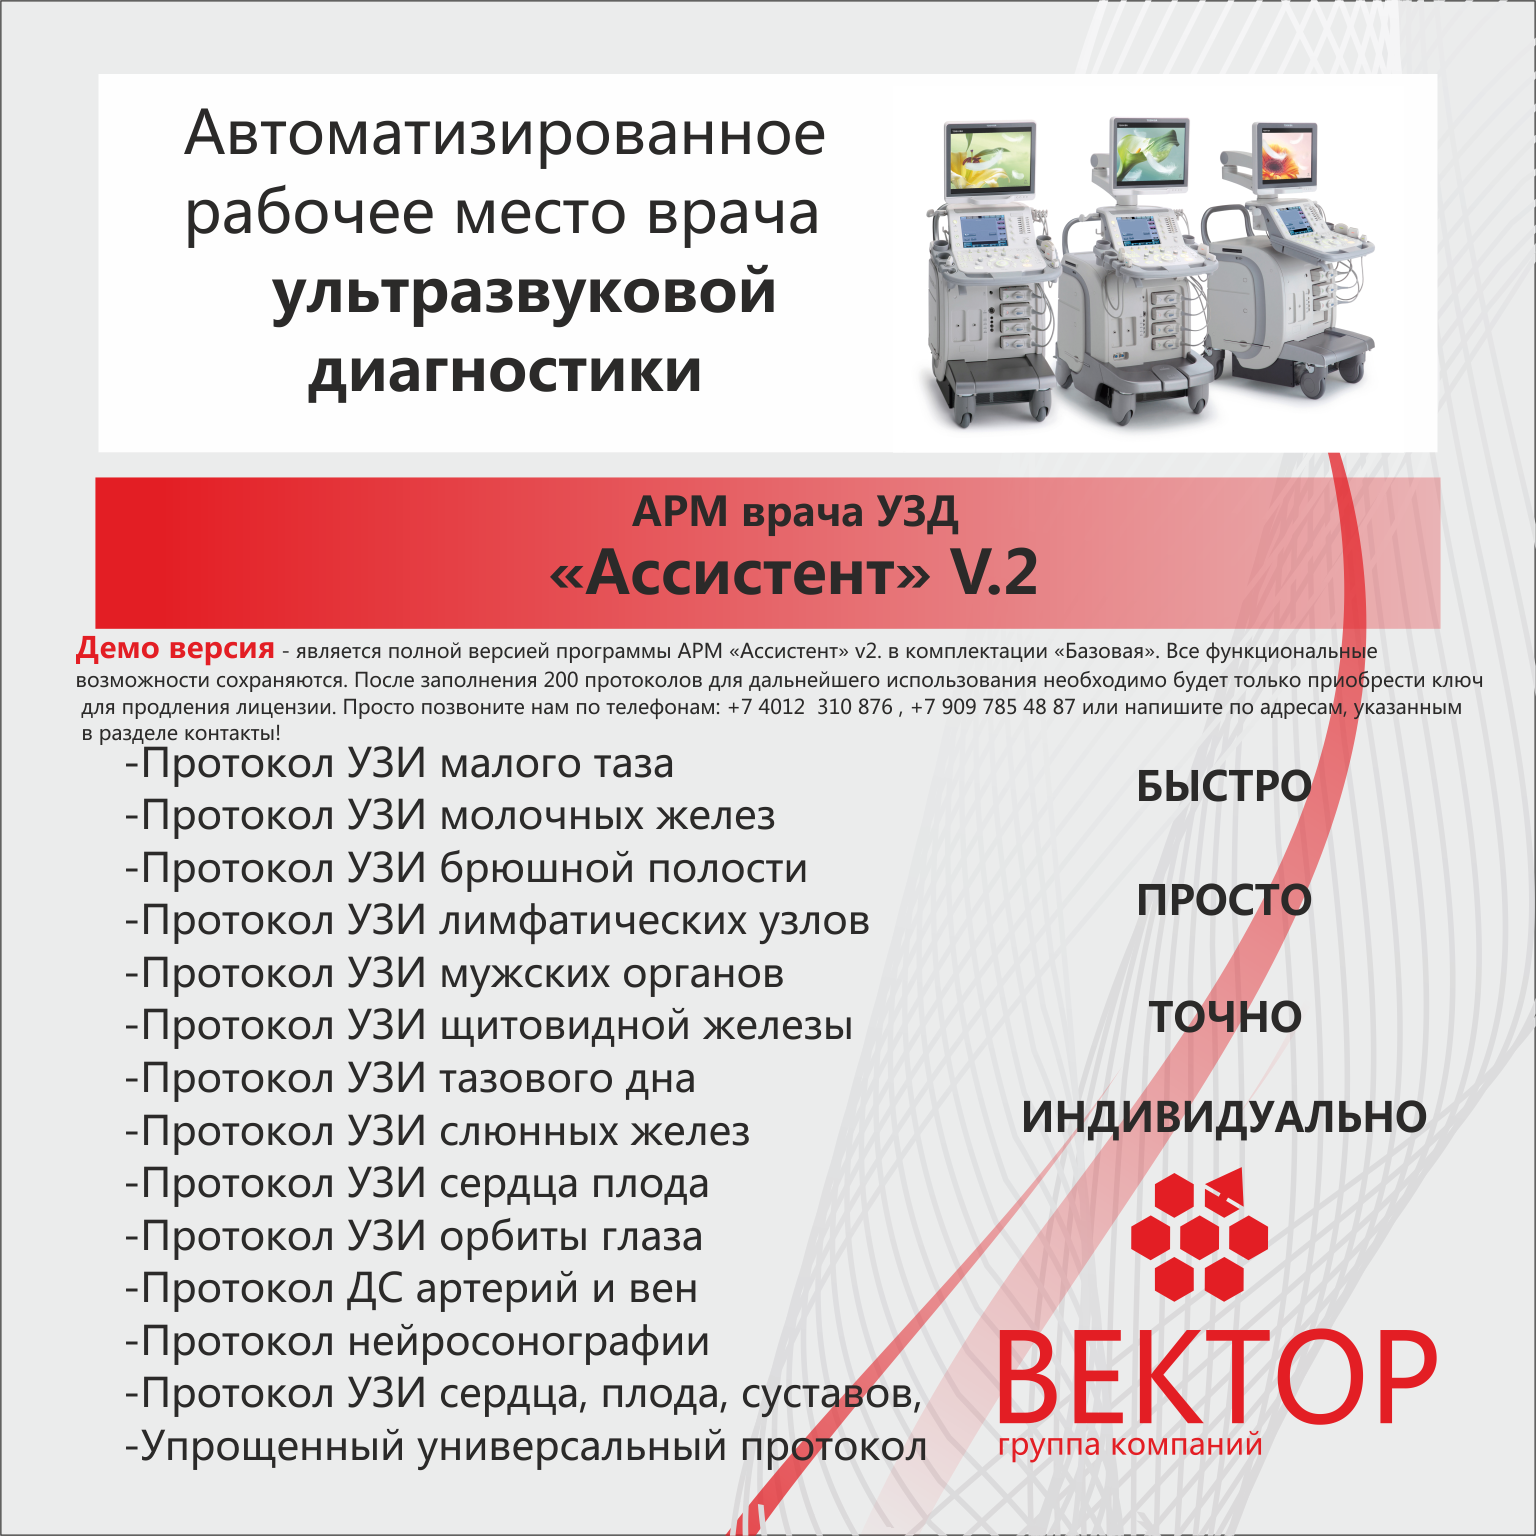 "АРМ врача УЗИ ""Ассистент V2.0"""